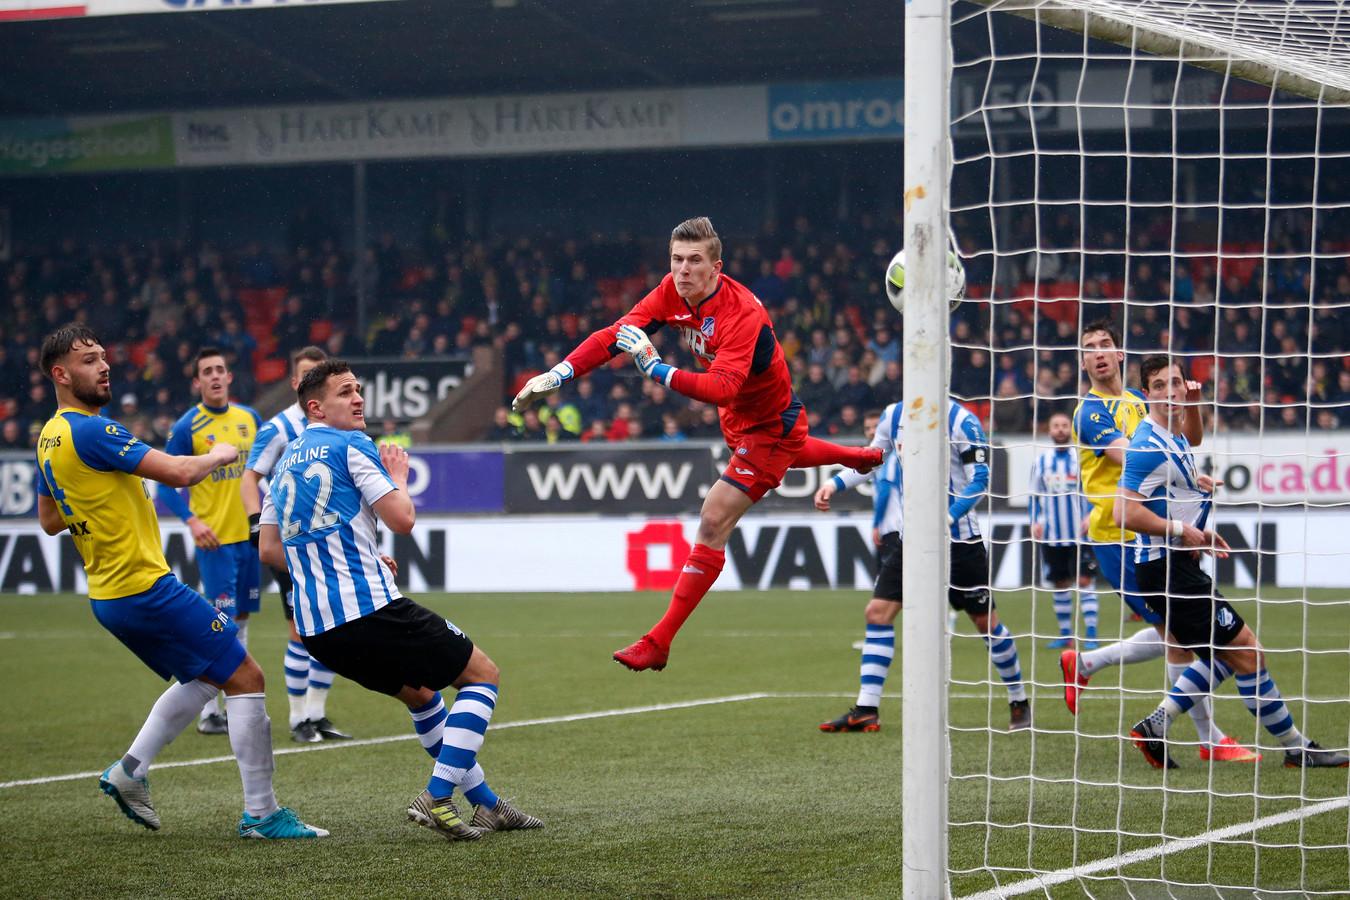 Thomas Hooyberghs in actie namens FC Eindhoven.